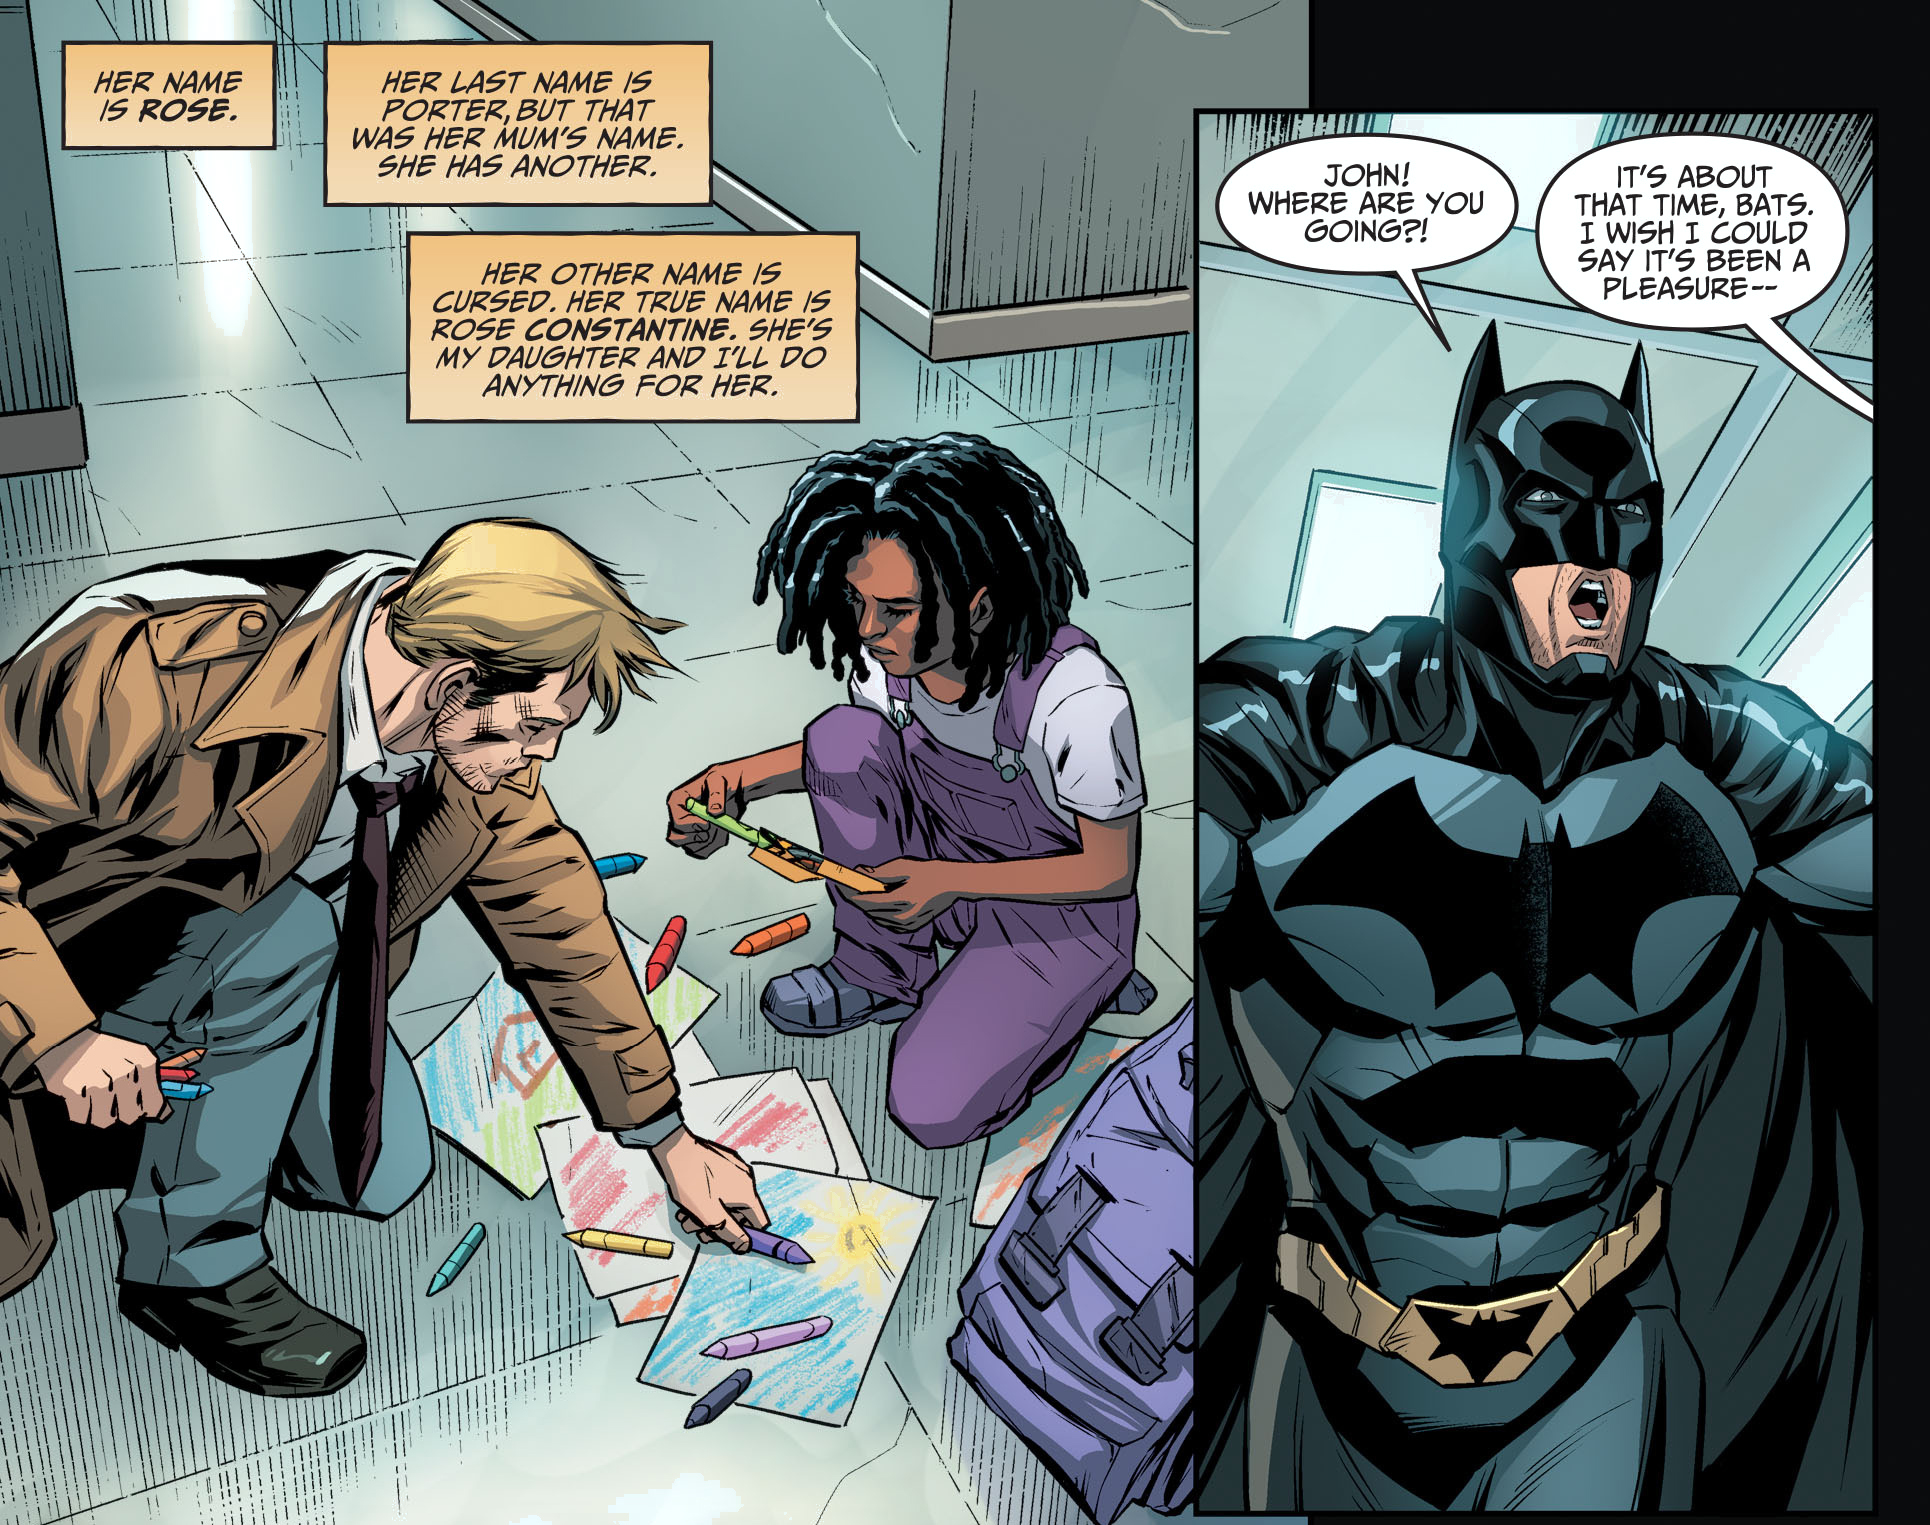 batman and john constantine, batman and john constantine comic, batman john constantine comic, constantine, hates john constantine, john constantine, john constantine comic, Justice League, Justice League constantine, Justice League Dark, Justice League john constantine,